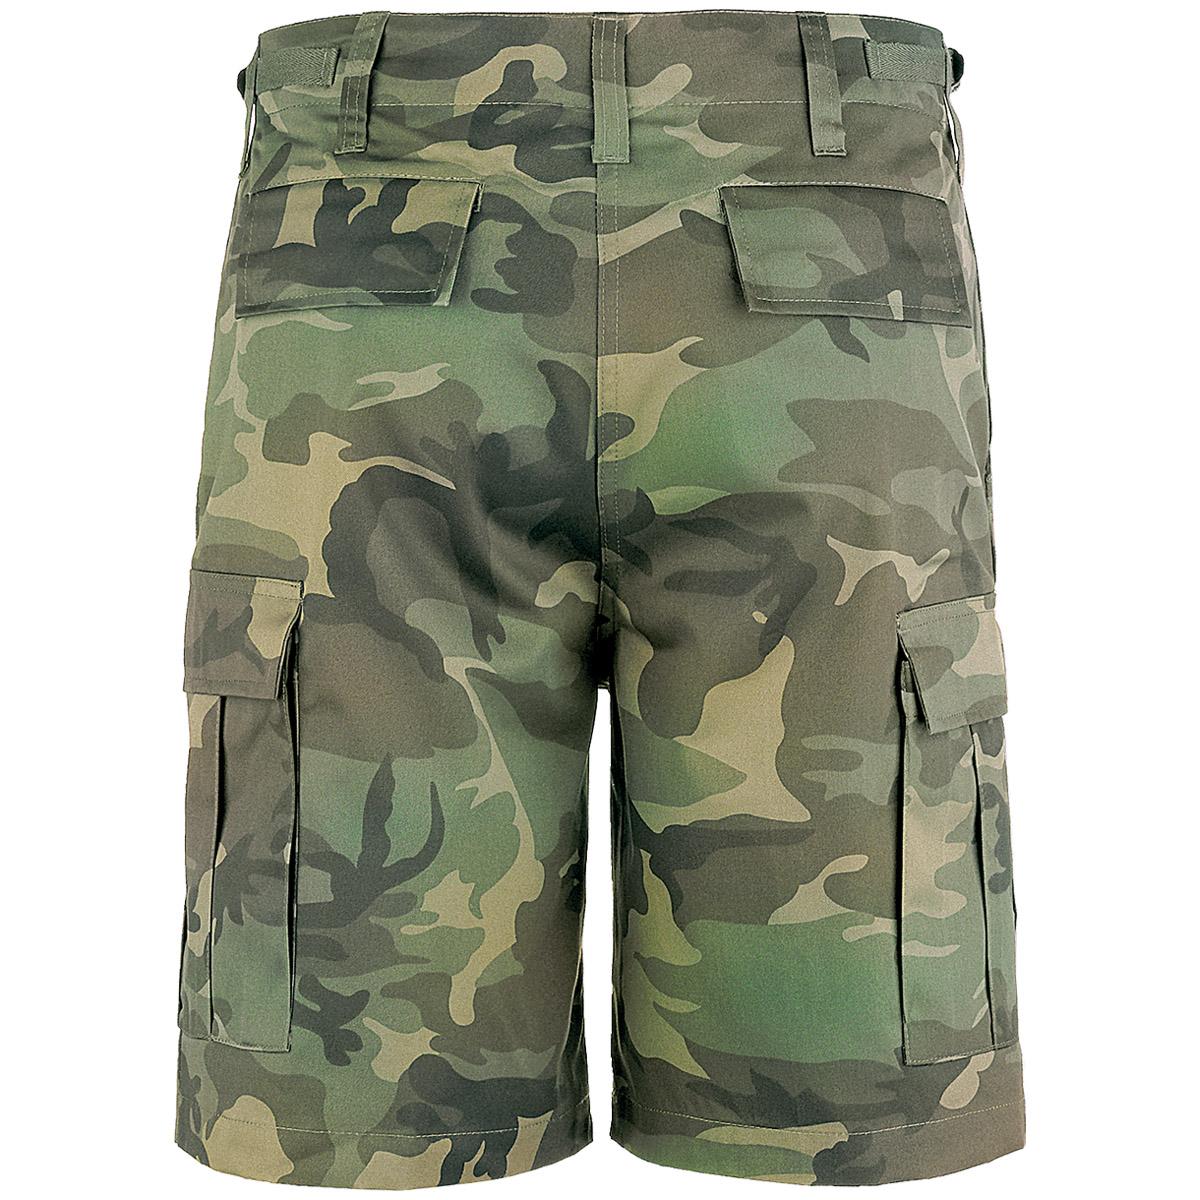 Brandit Combat Ranger Shorts Cargo Army Military Pages Pocket Bermuda